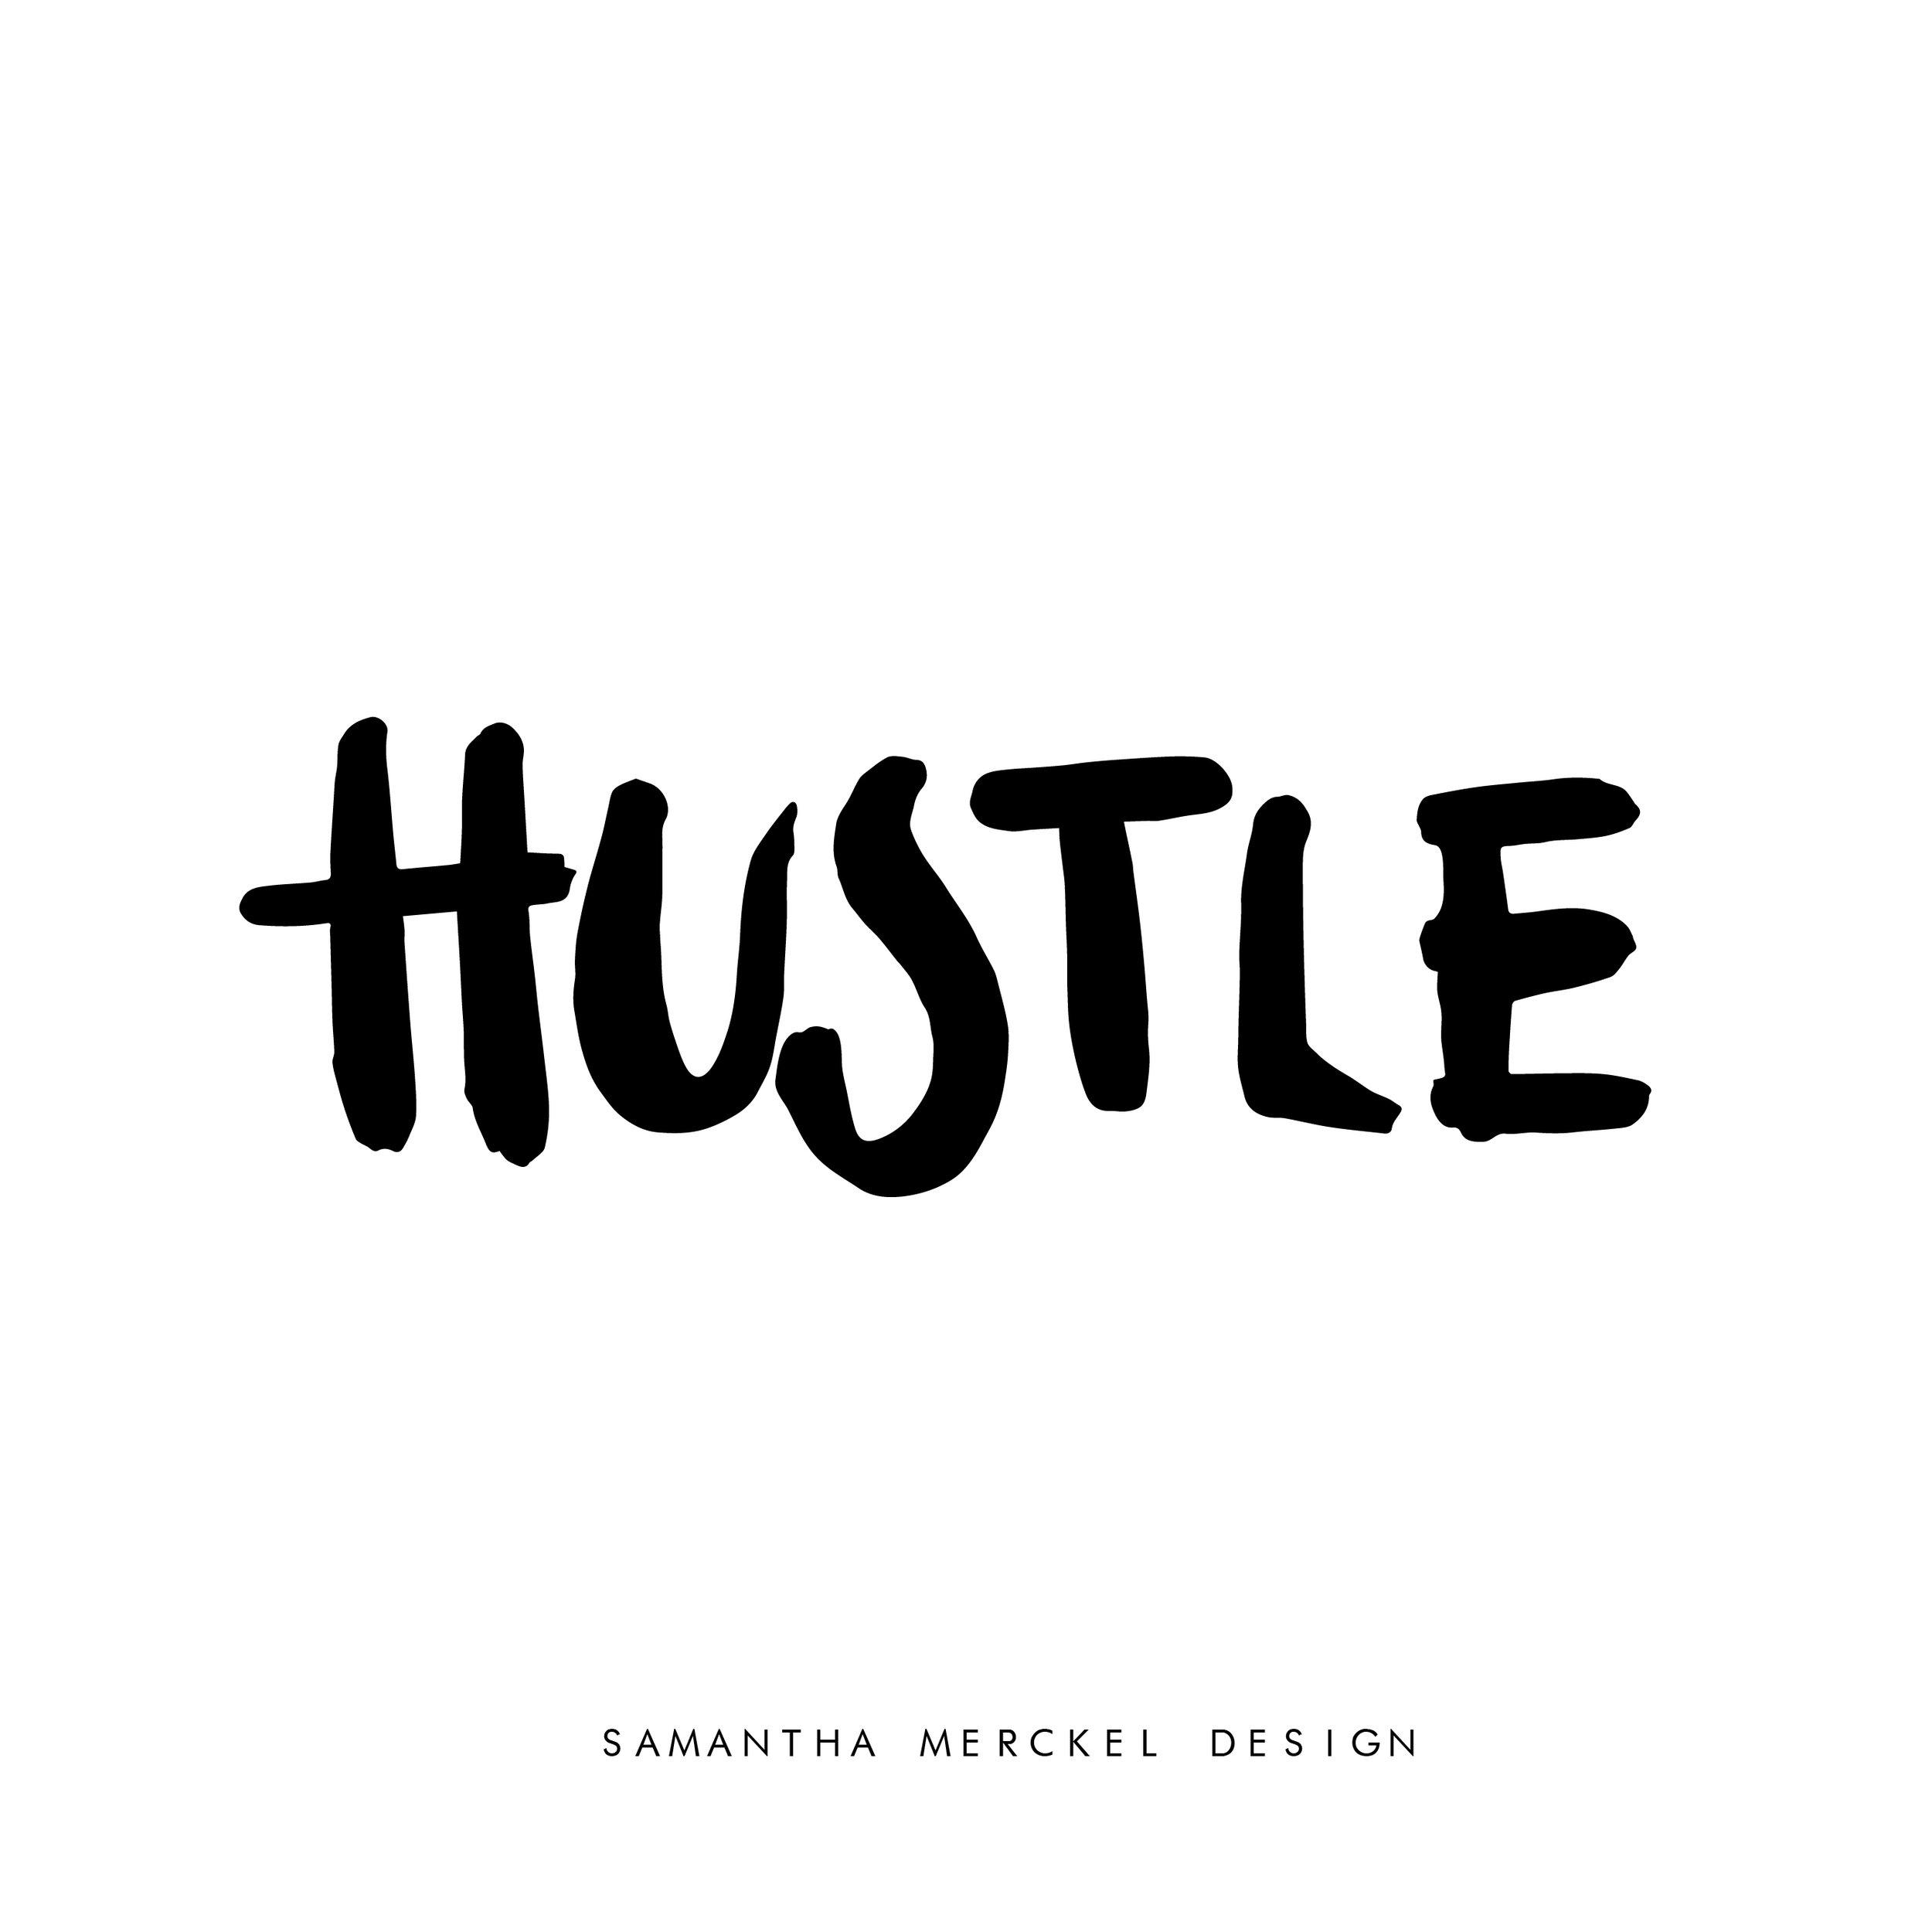 hustle-01.jpg